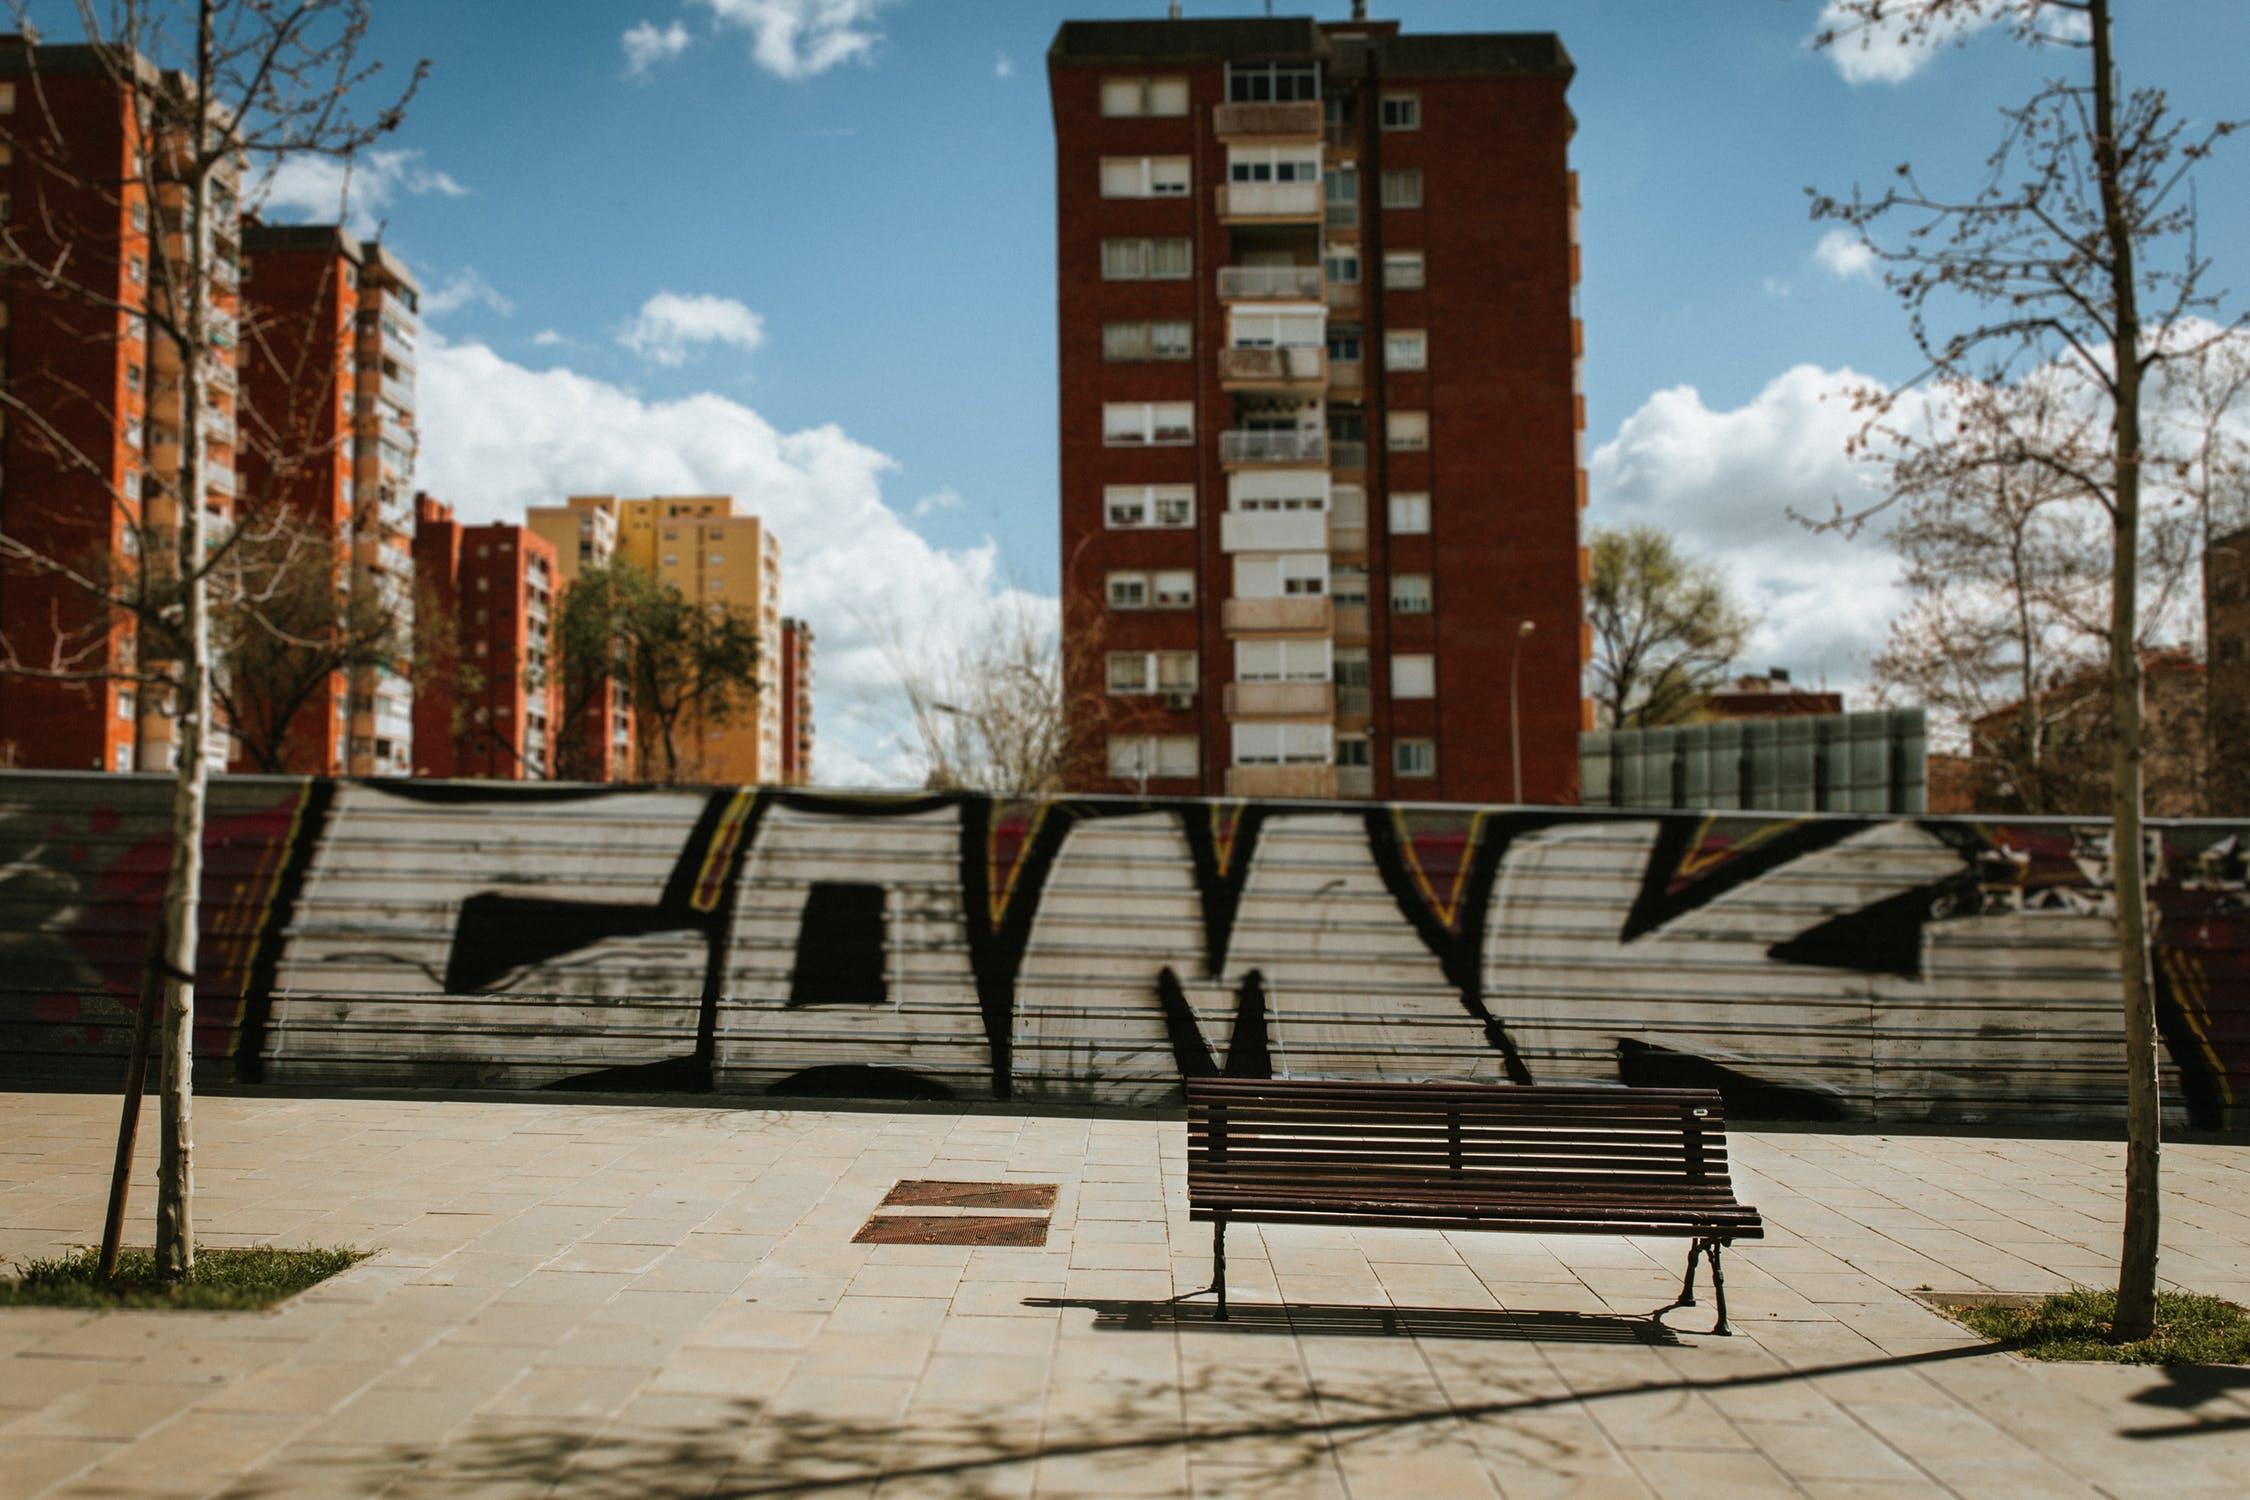 graffiti on the fence, graffiti on the fence